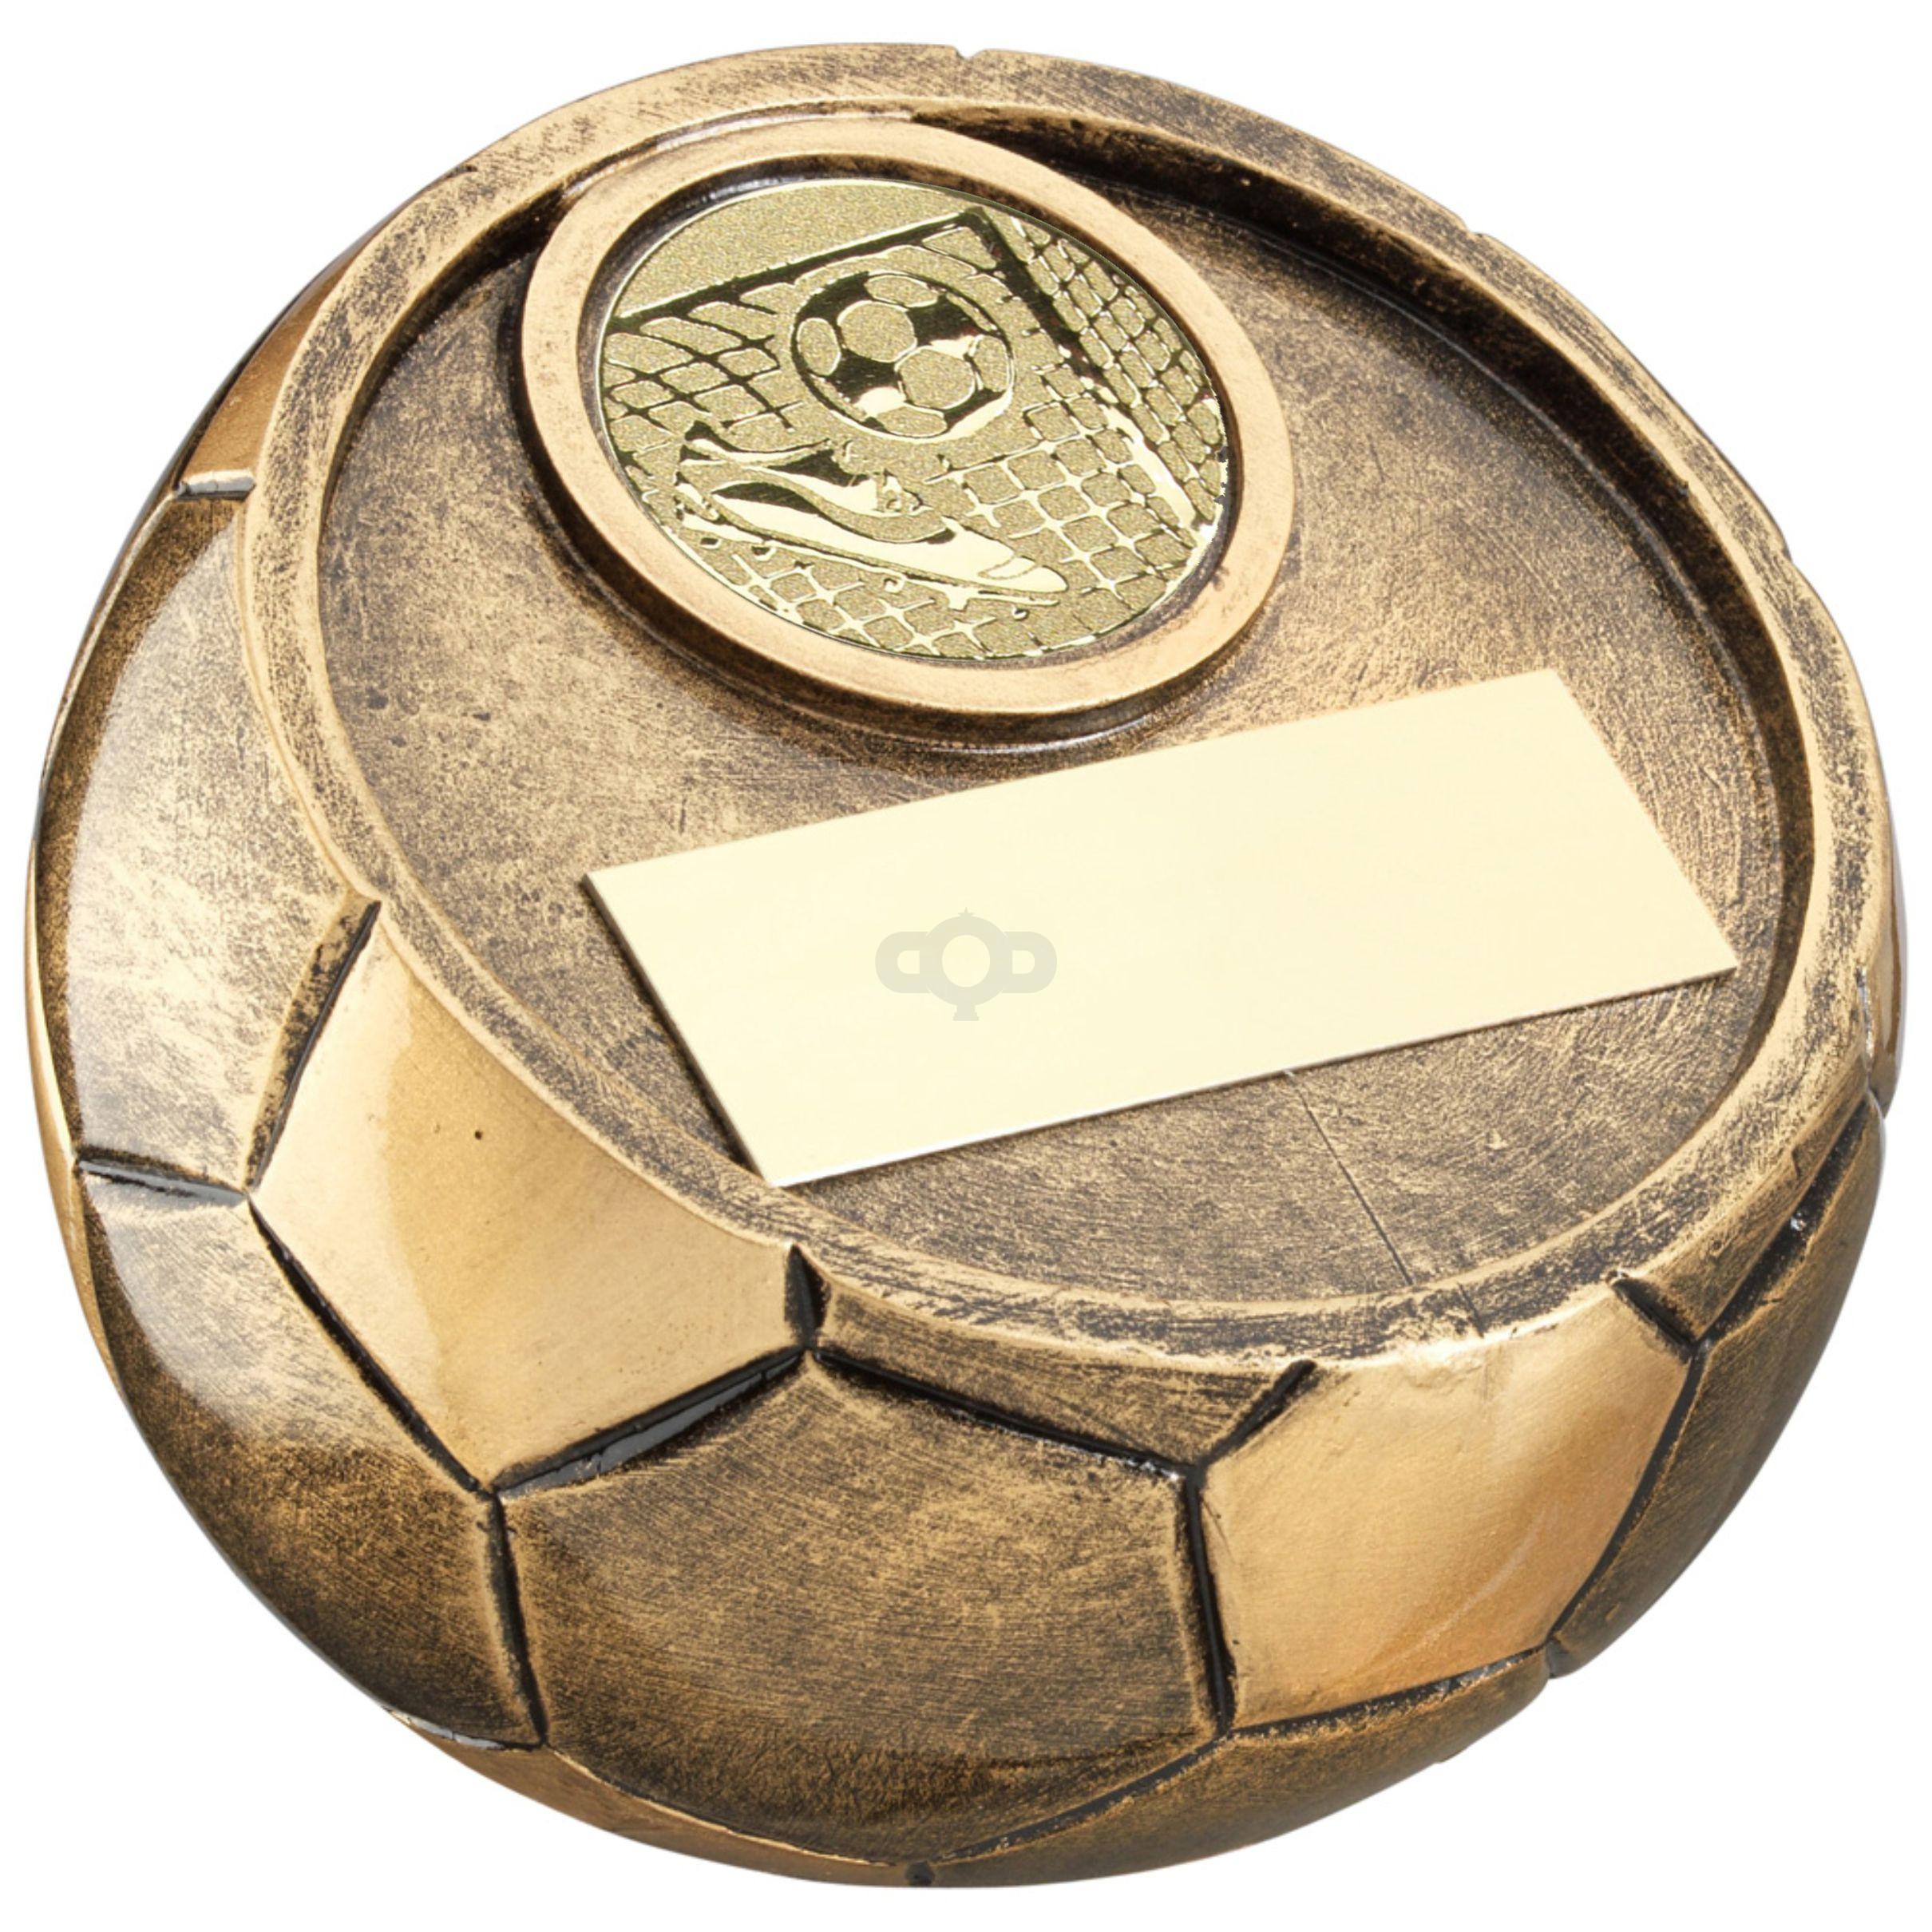 Full 3D Angled Football Trophy